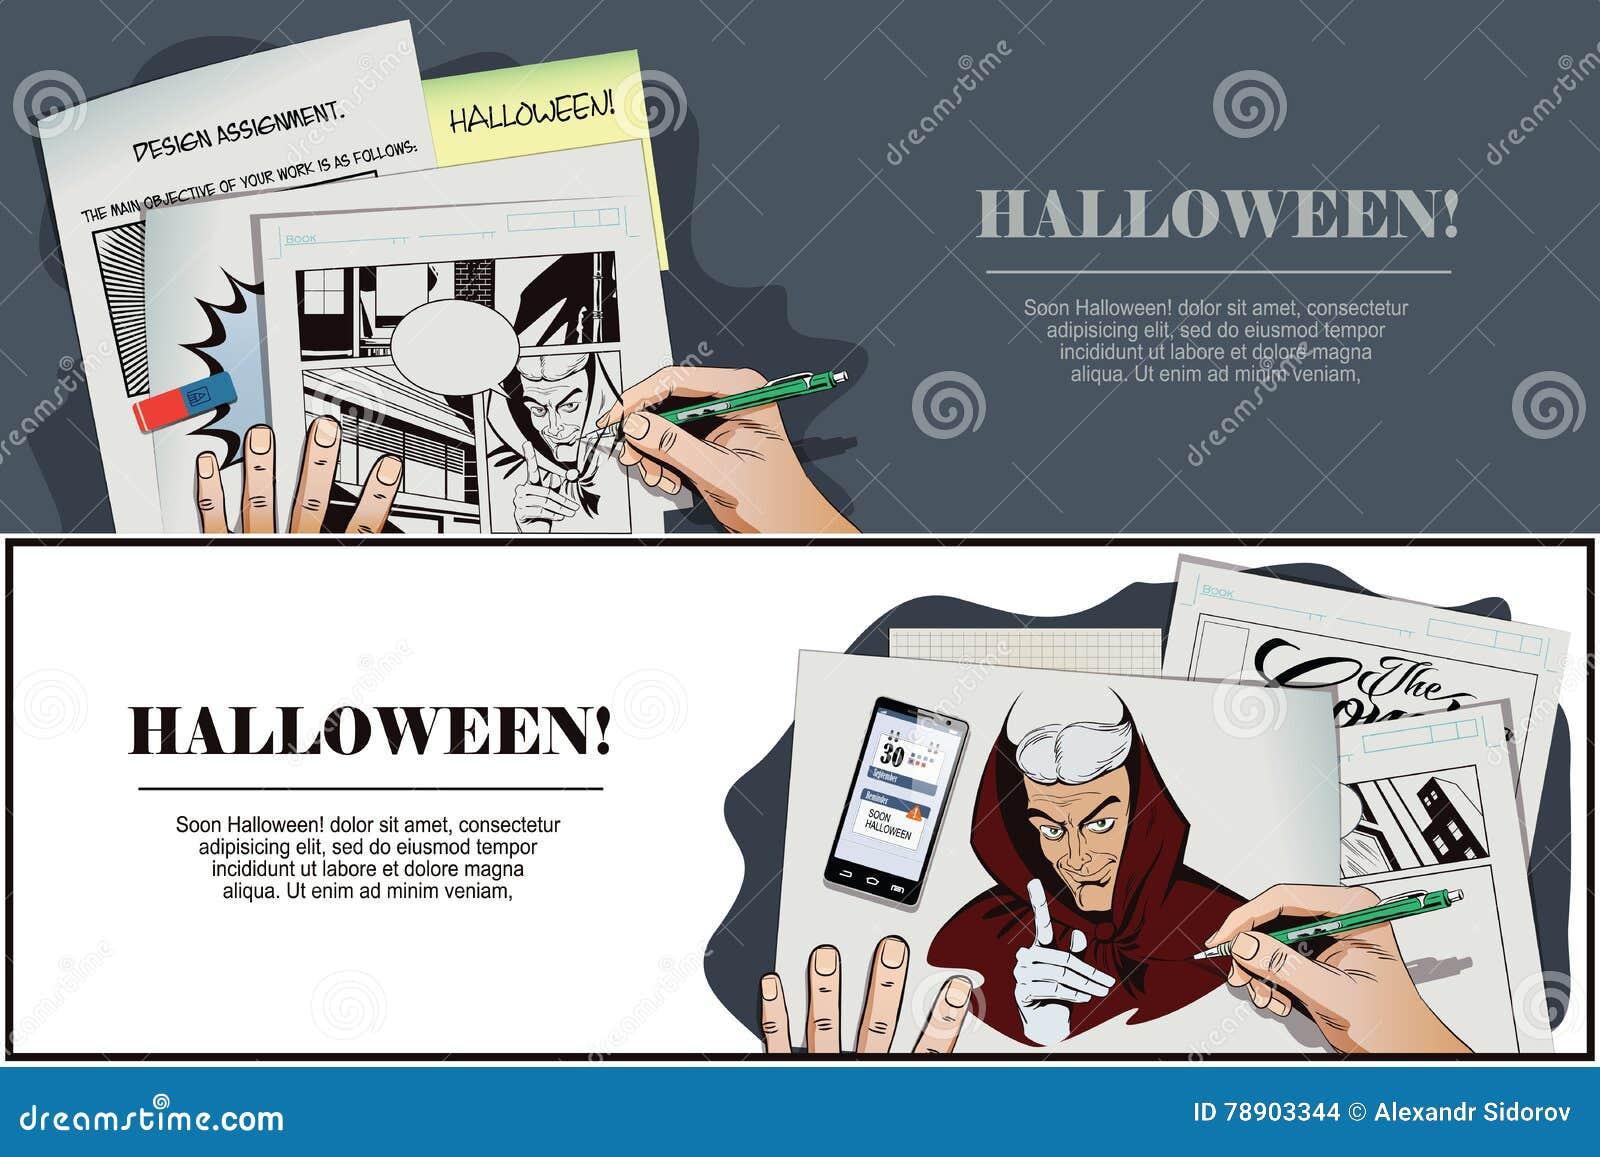 Halloween Creative Ads.Satan Reminds About Halloween Stock Vector Illustration